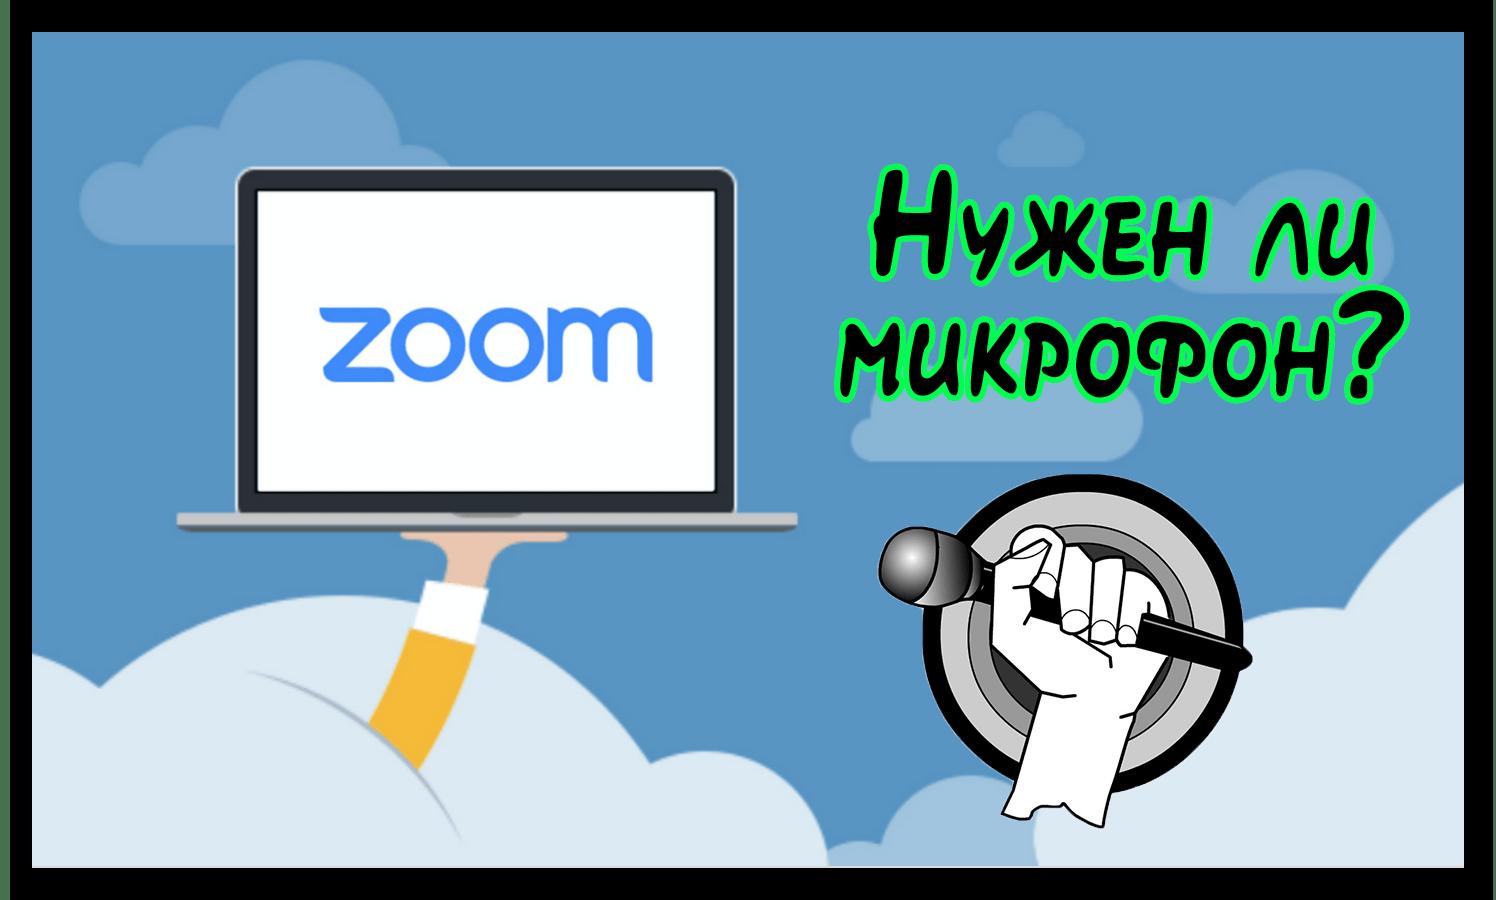 Картинка Нужен ли микрофон для Zoom